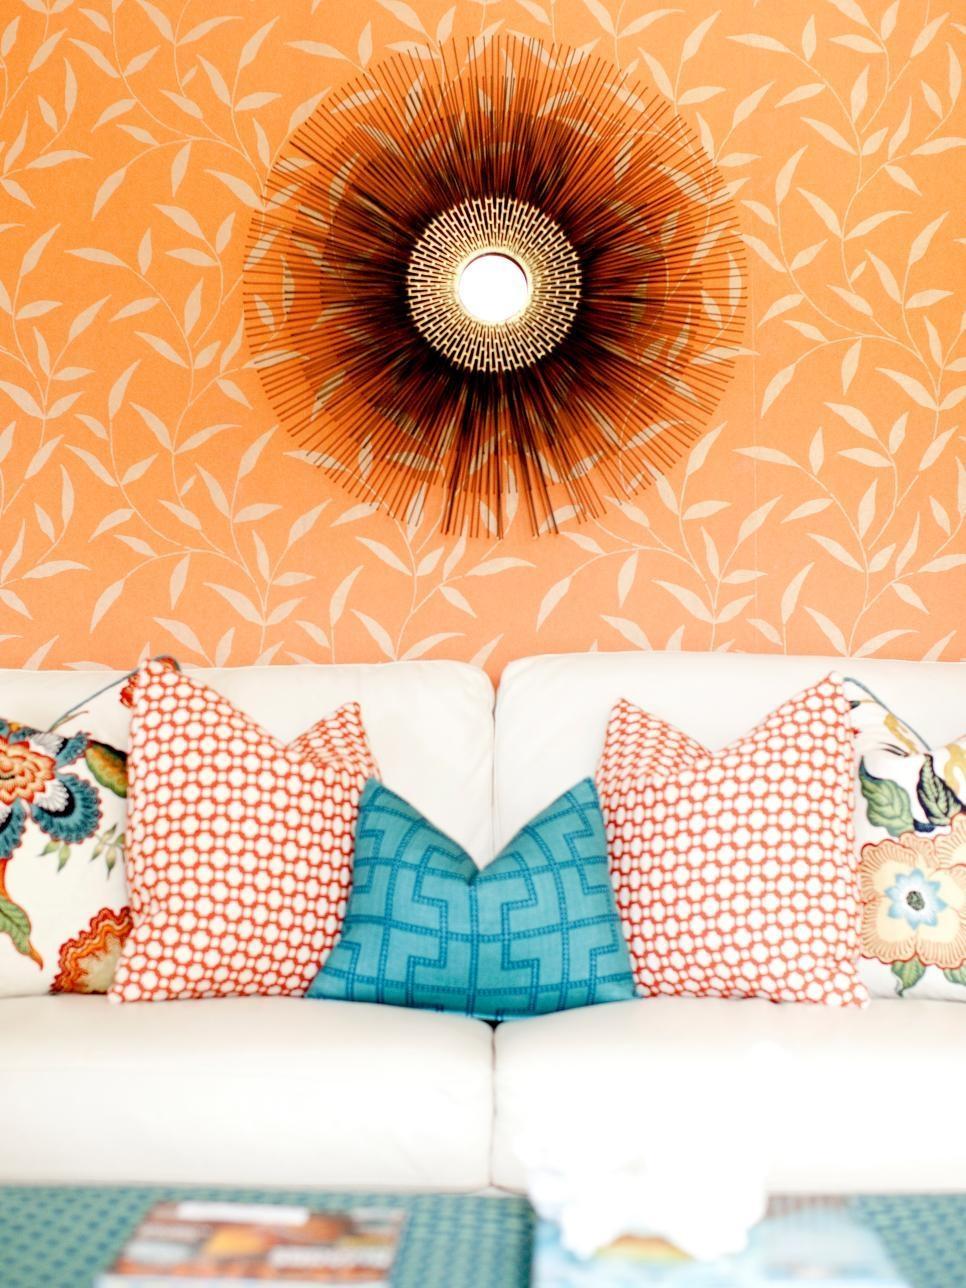 Relaxing Turquoise Wall Art Aqua Color Palette Aqua Color Schemes Hgtv Orange Turquoisewall Art Wall Art Orange Turquoise Pink Color Palette Turquoise Color Palette Code houzz-02 Turquoise Color Palette